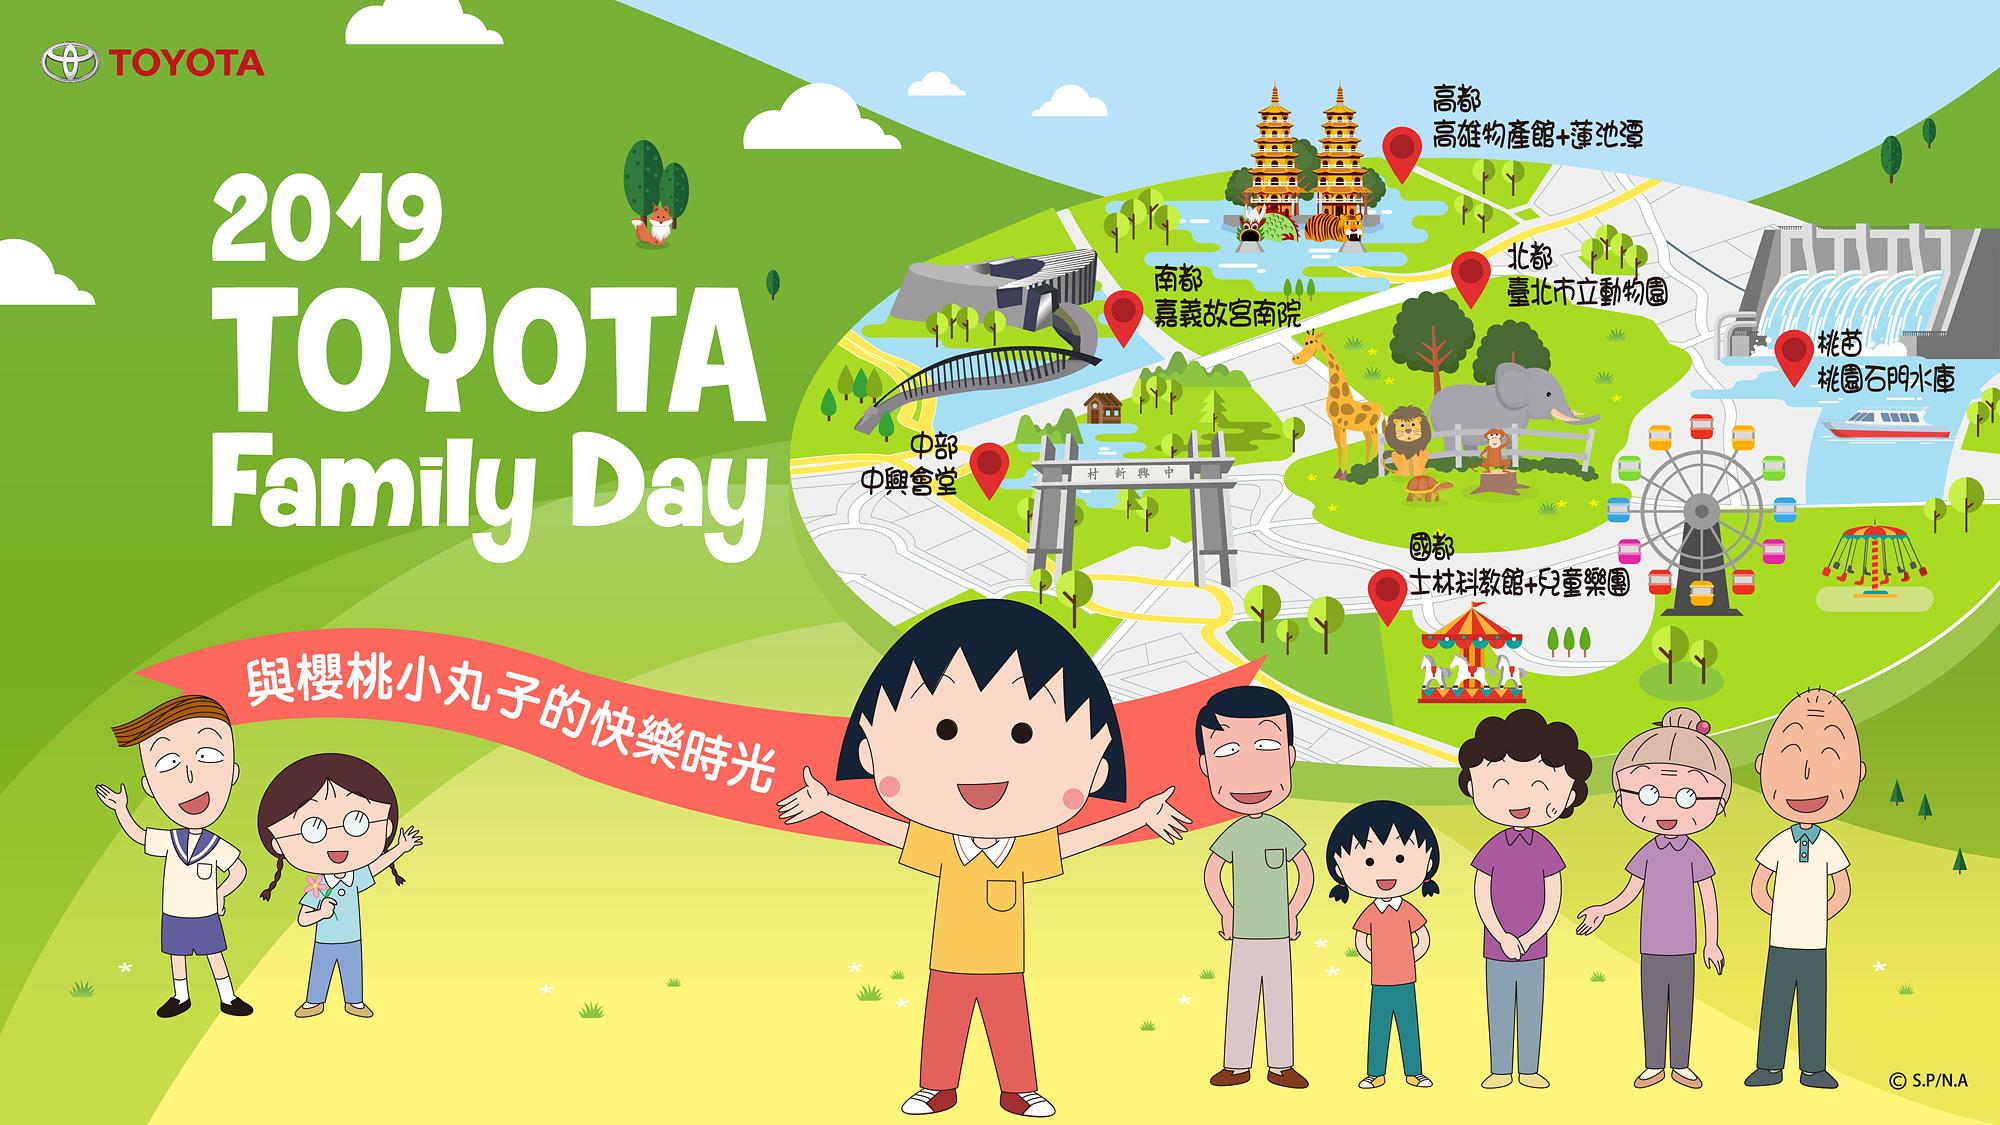 2019 Toyota Family Day 11月開跑,與櫻桃小丸子共度快樂時光